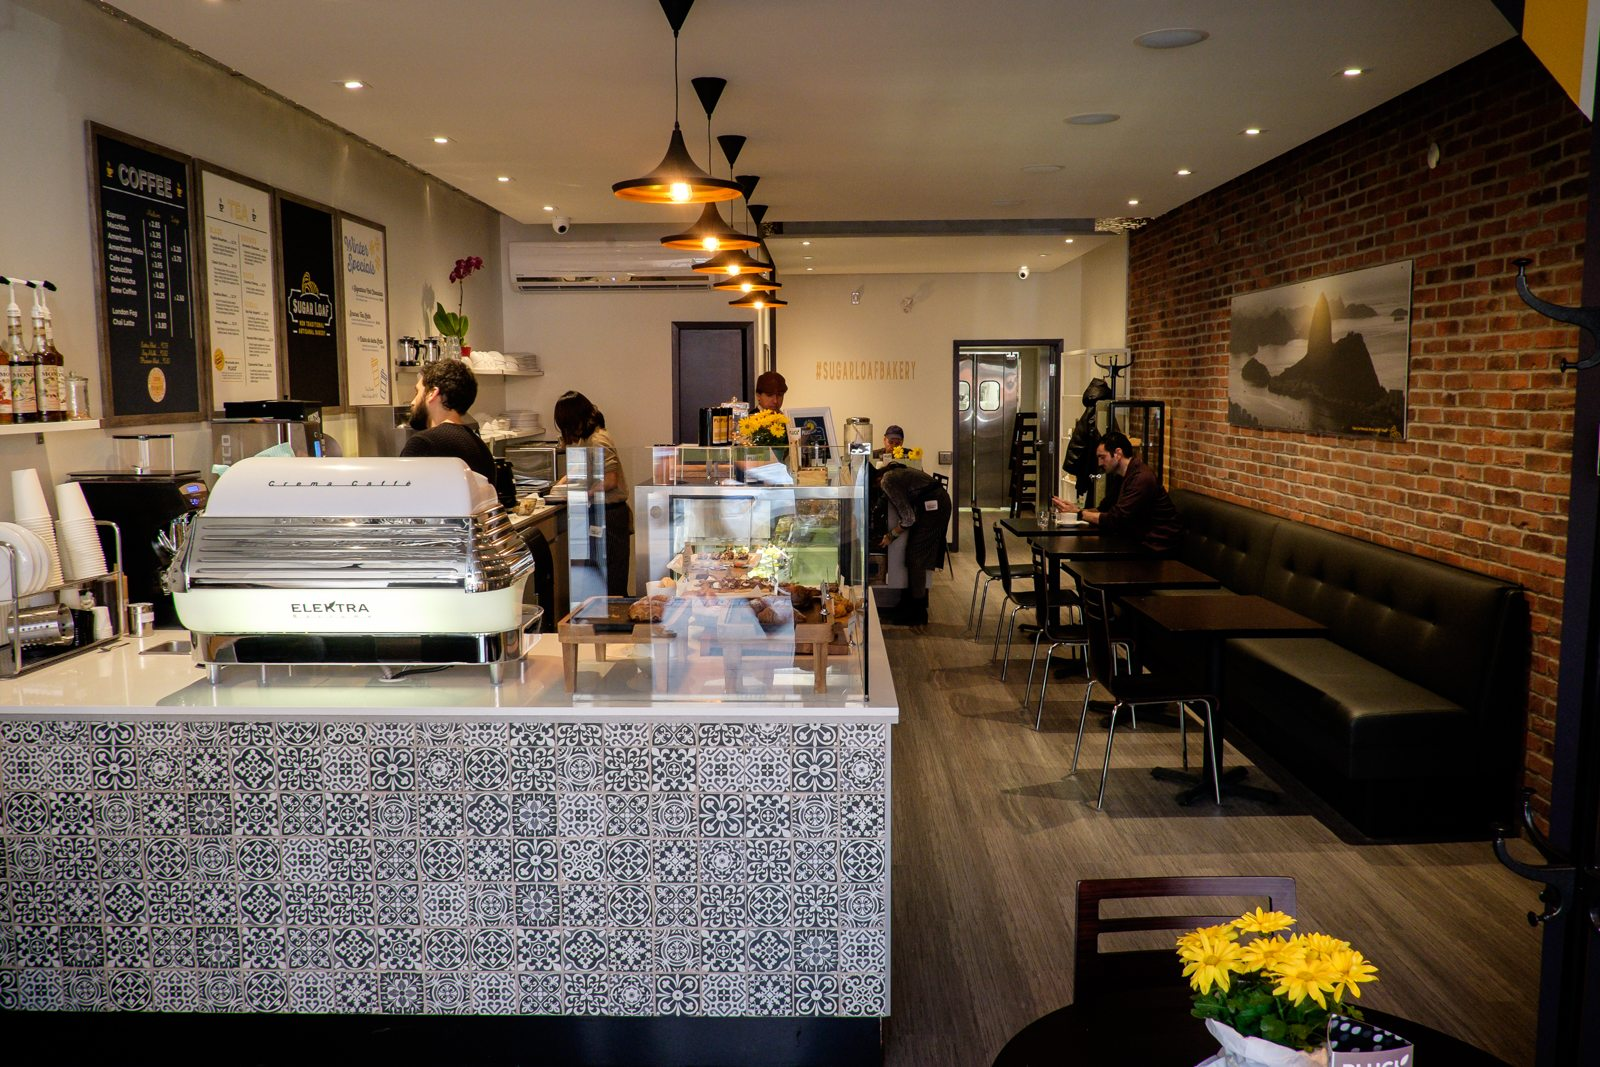 toronto-bakeries-cafes-sugar-loaf-bakery-leslieville-interior